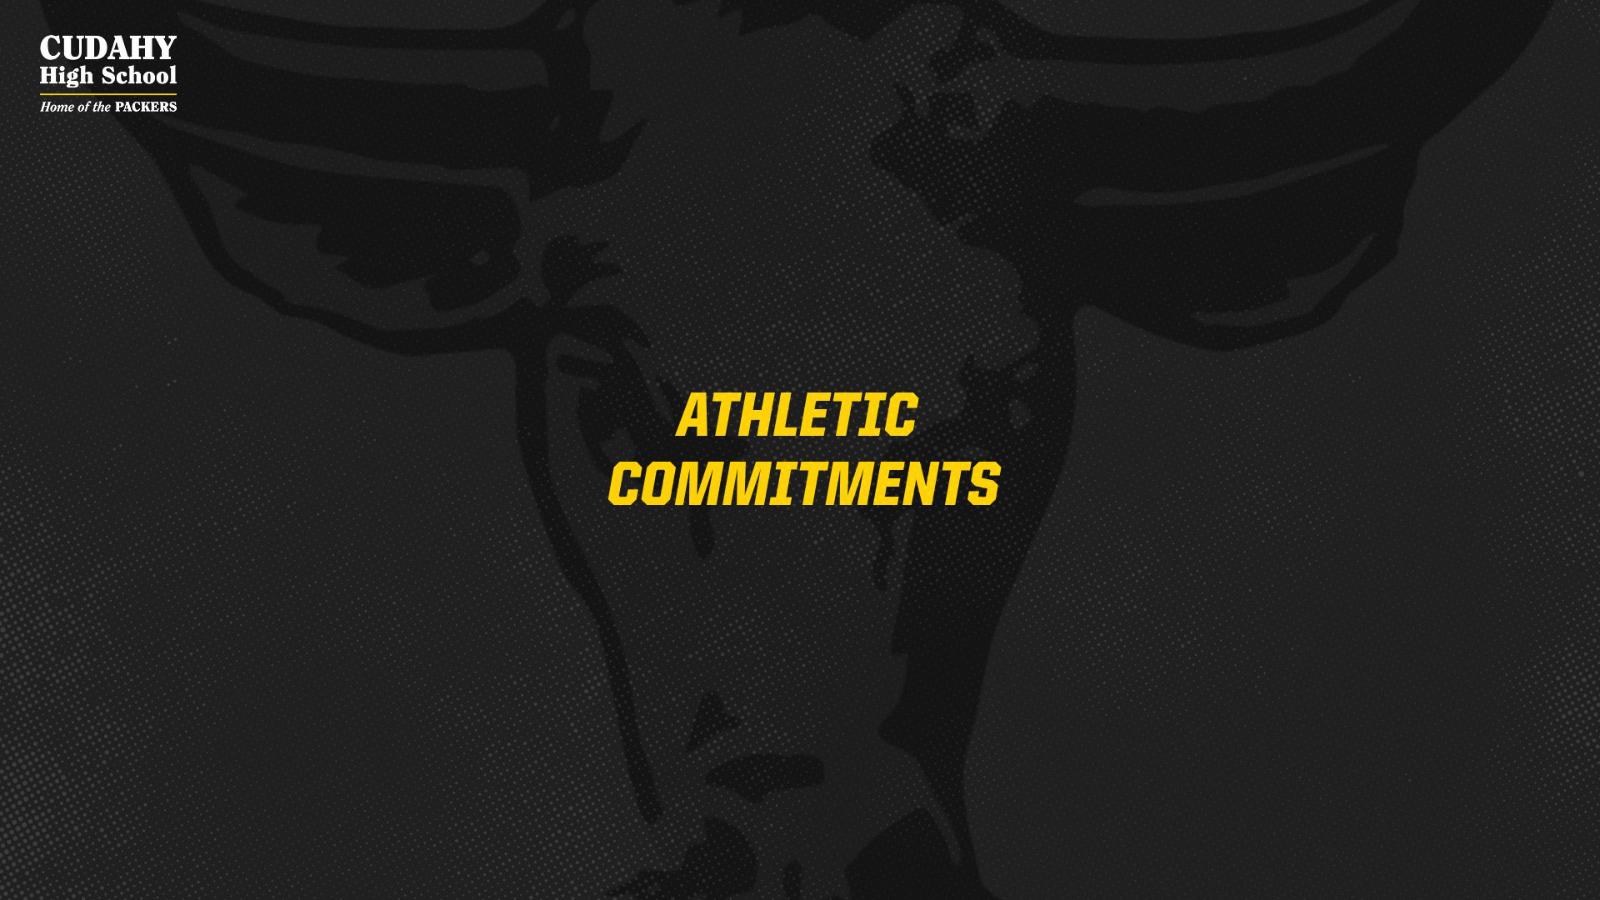 2020-21 Senior Athletes Make Their Post-Secondary Commitments